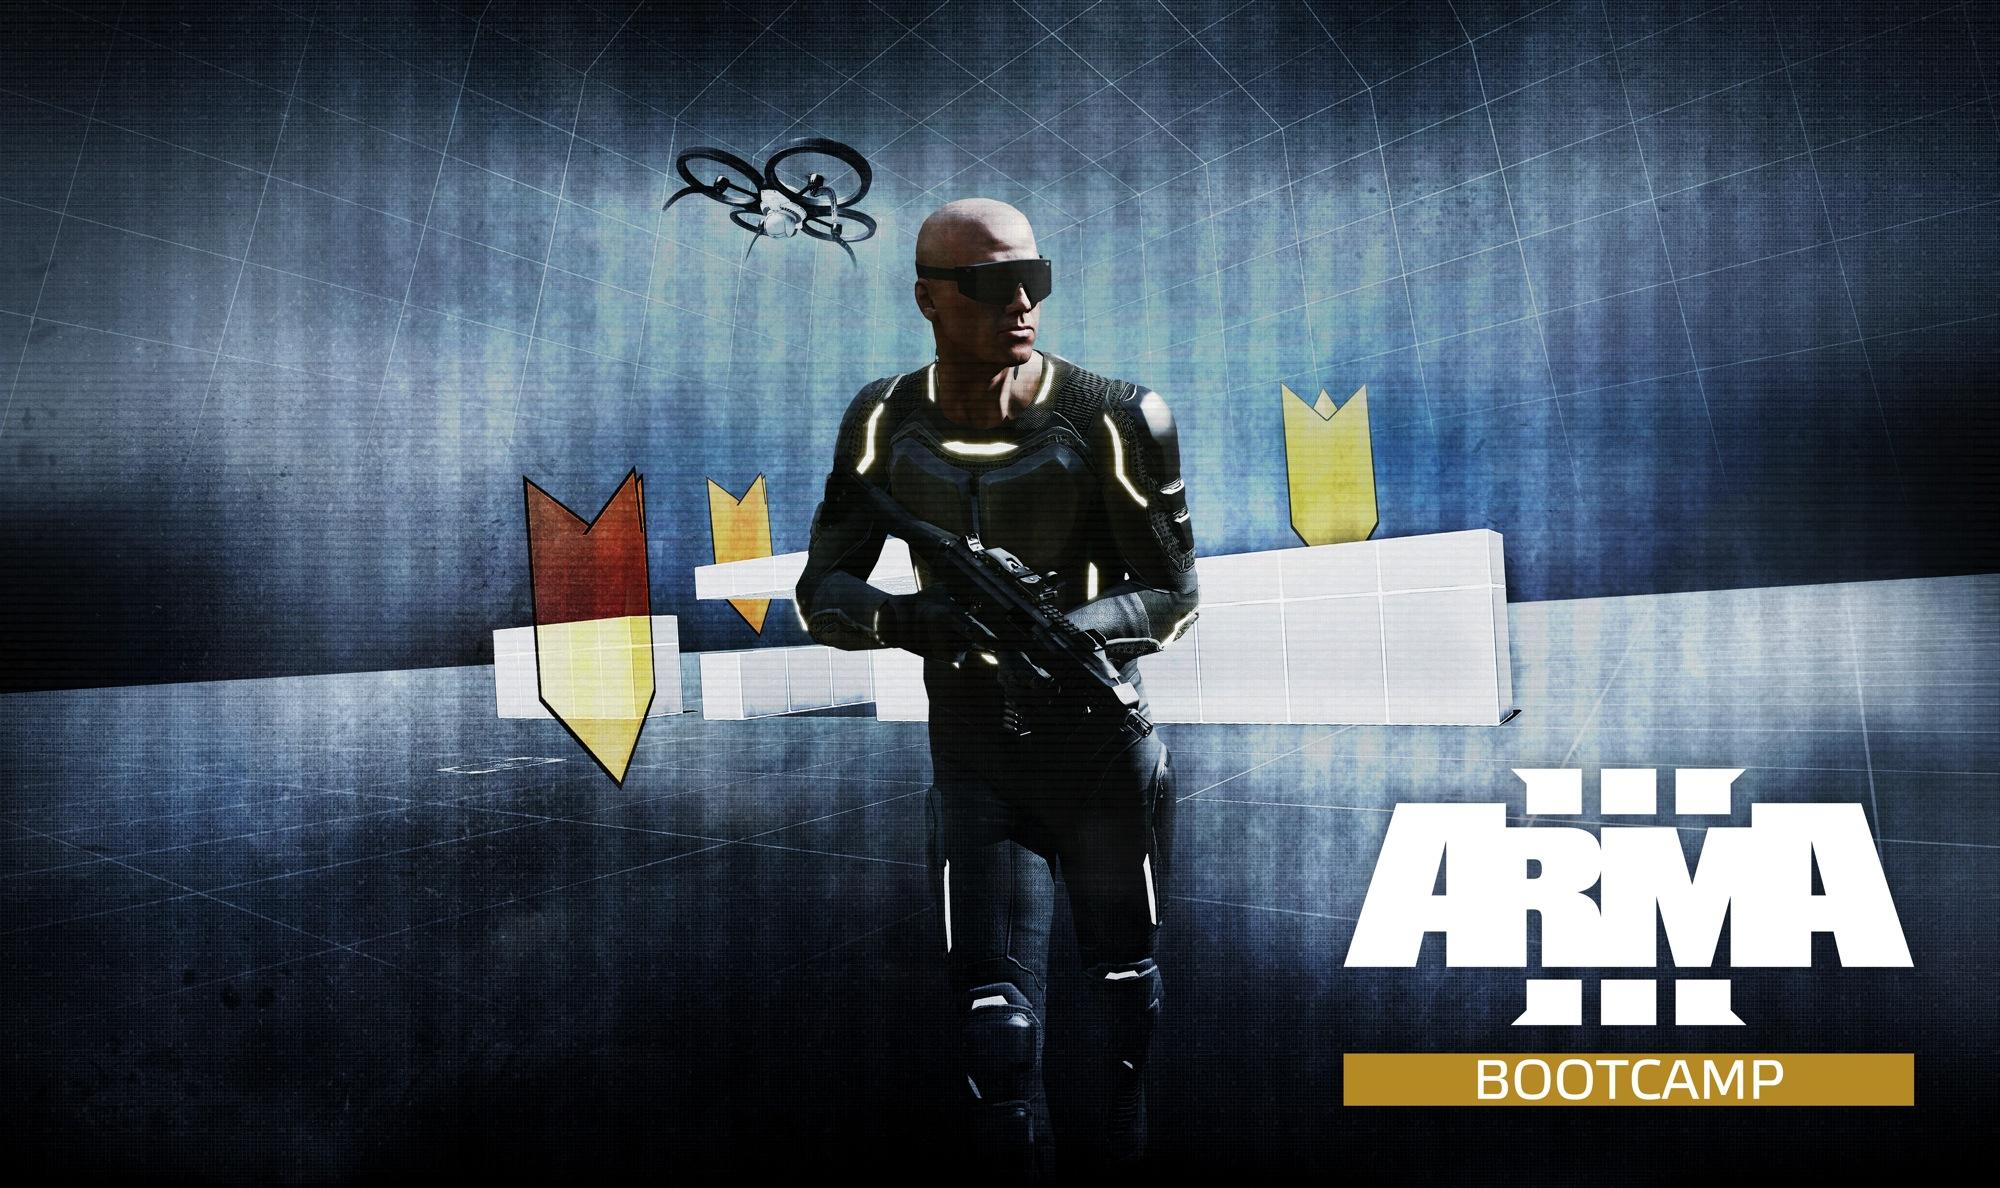 Arma 3 Bootcamp